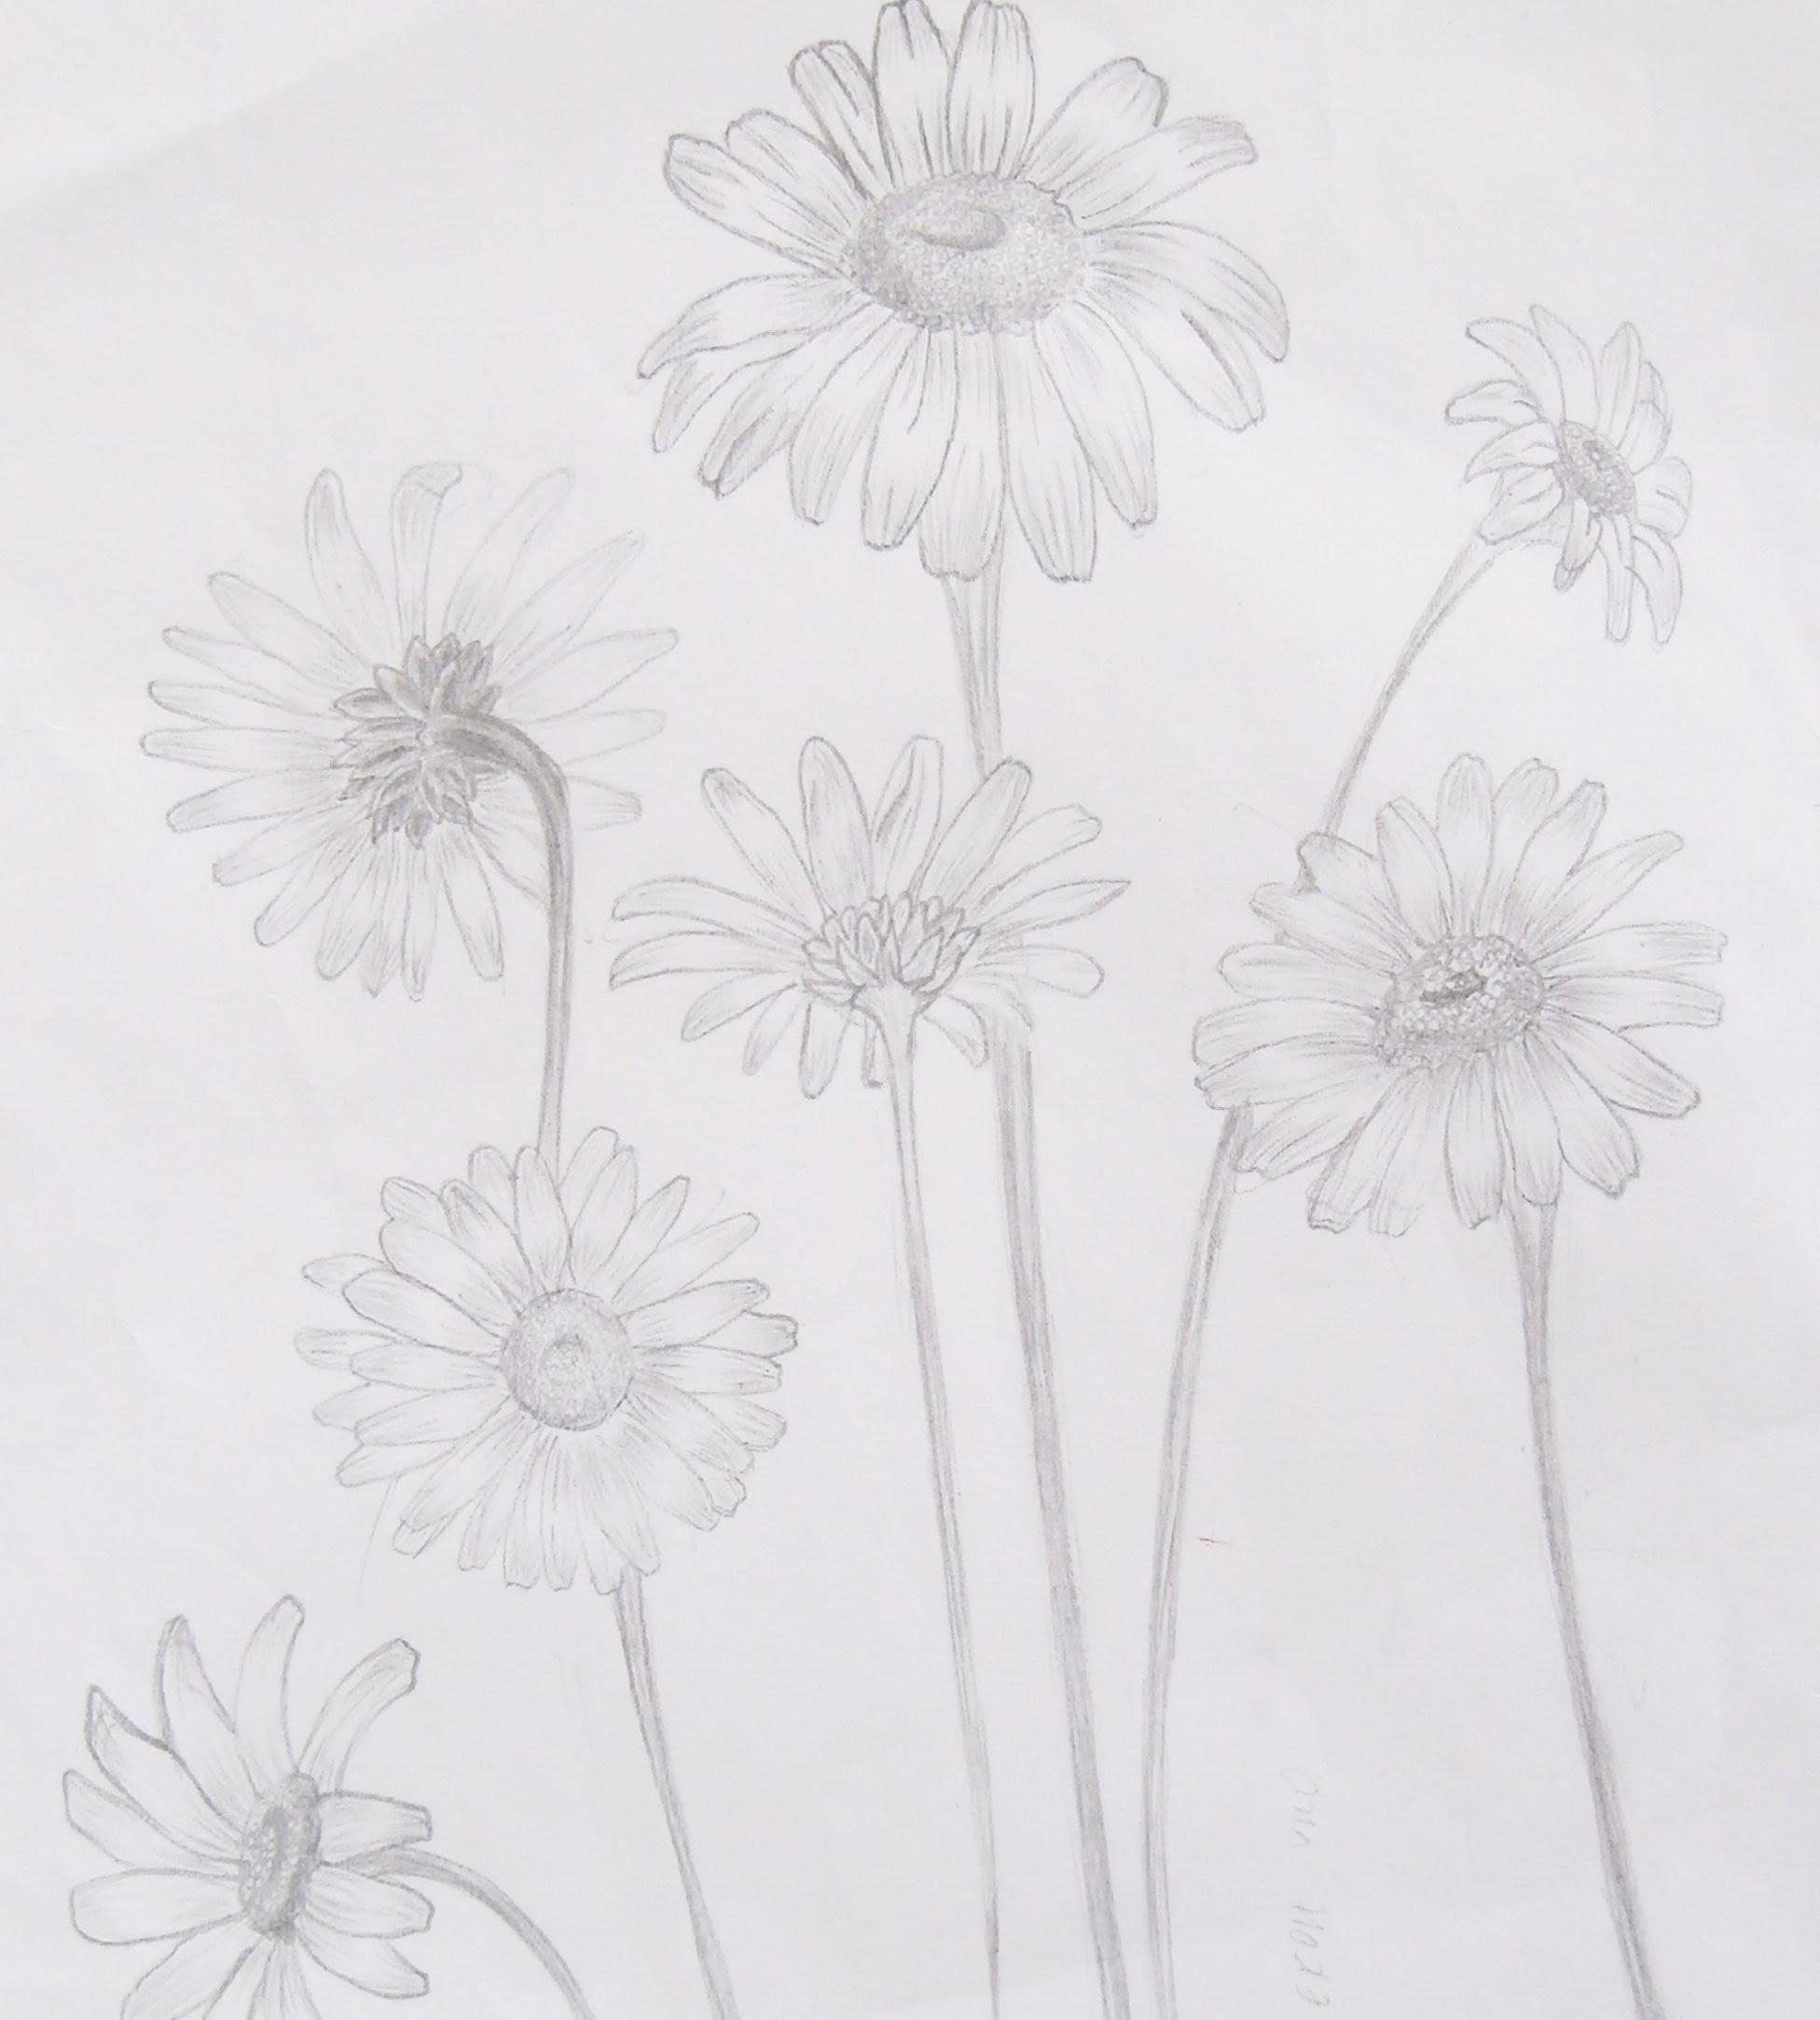 Drawn poppy realistic Lesson How lesson realistic draw